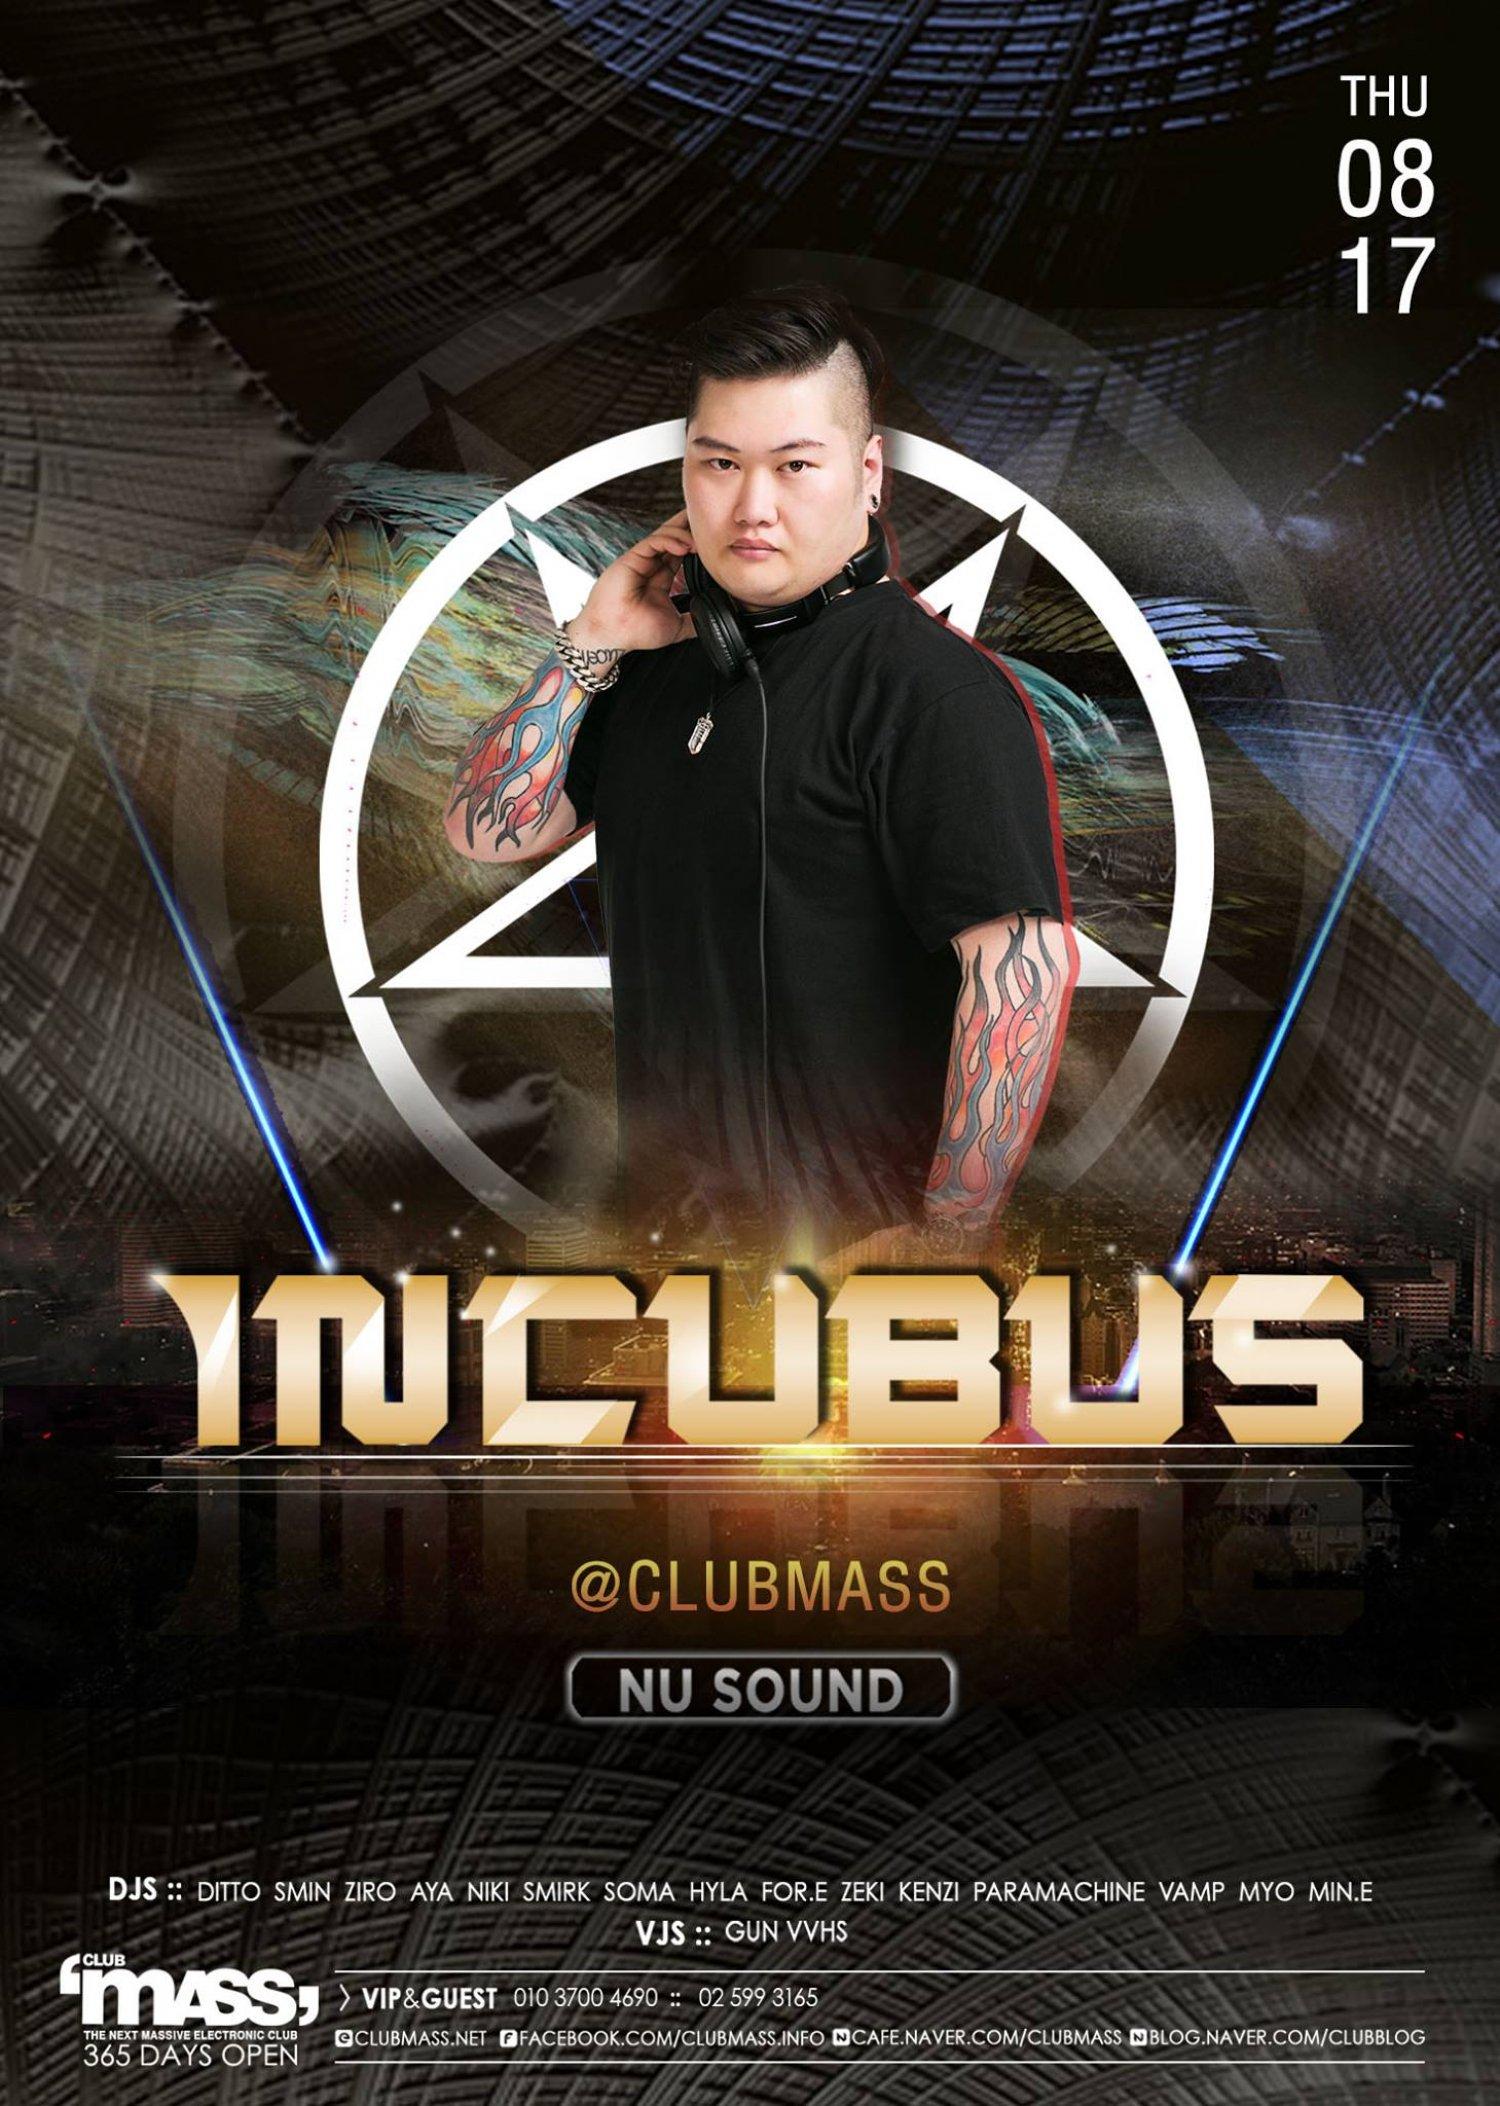 NU SOUND PARTY GUEST DJ INCUBUS